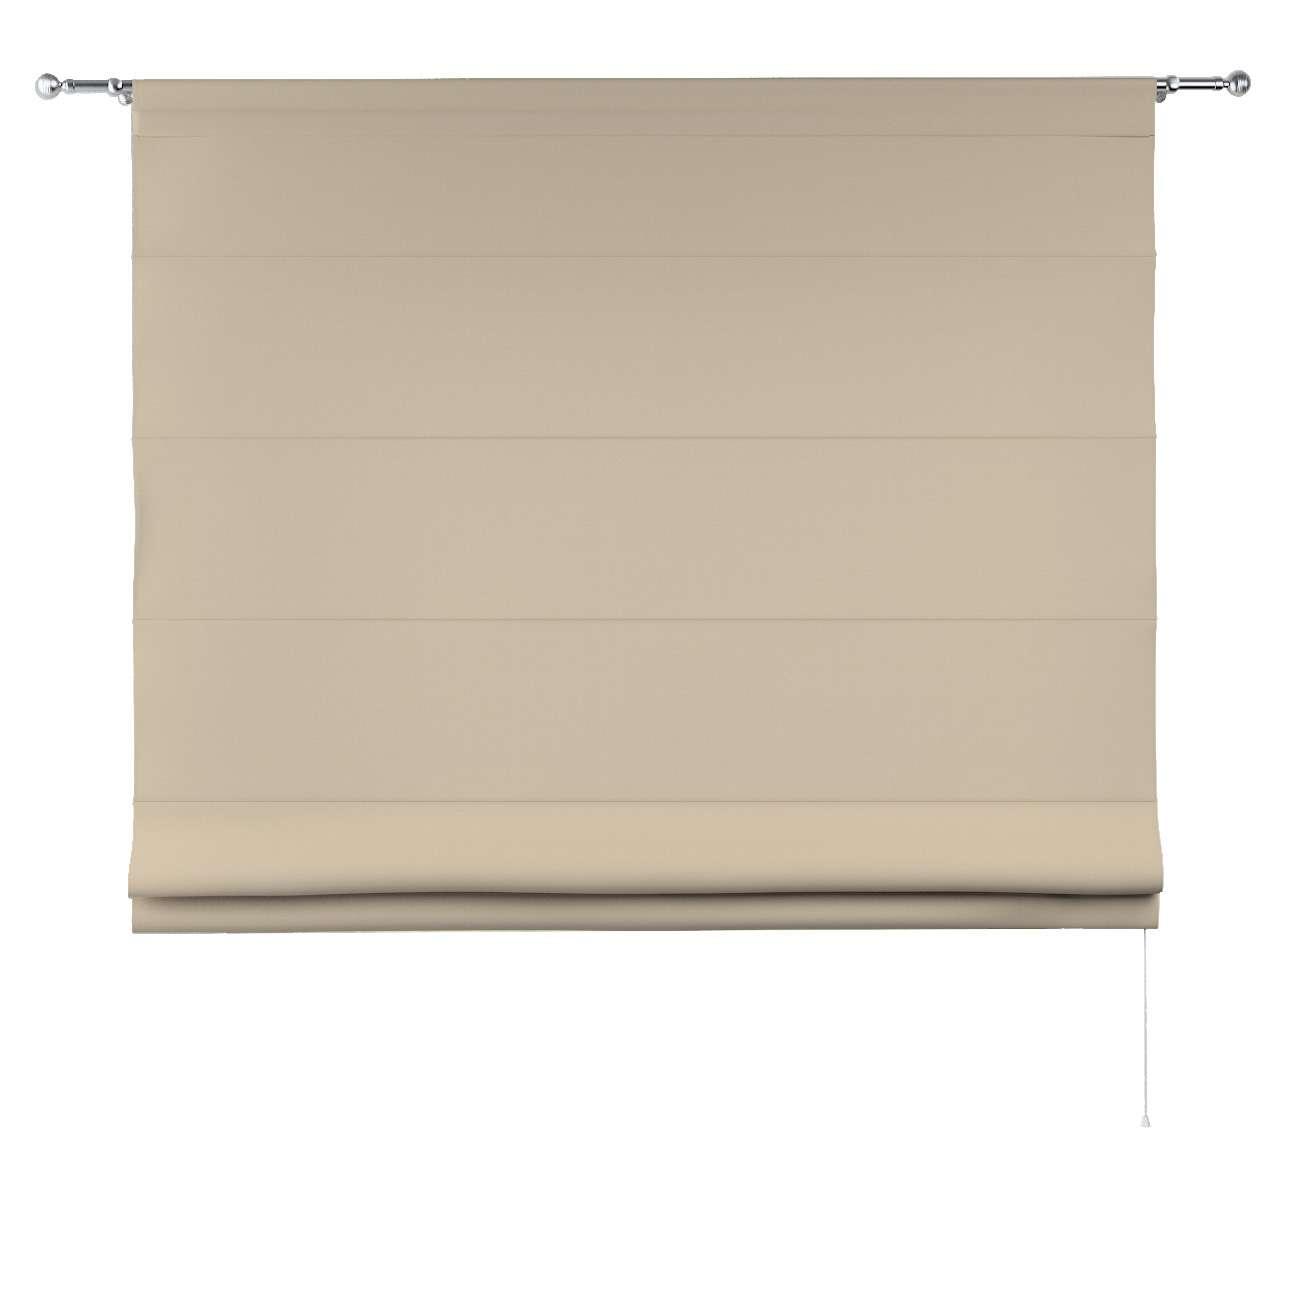 Rímska roleta Torino V kolekcii Cotton Panama, tkanina: 702-01